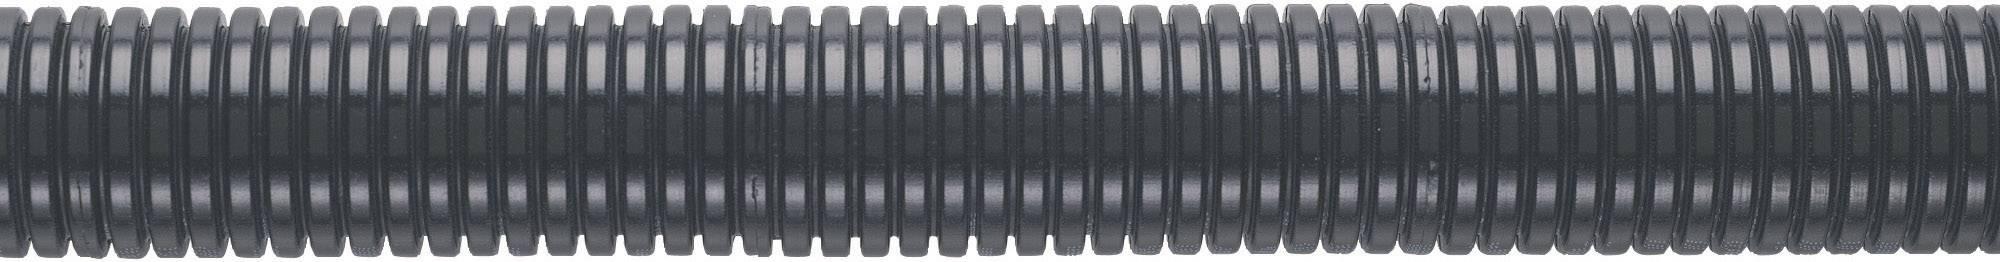 LappKabel SILVYN® FPAS 21 61754035, 16.70 mm, čierna, metrový tovar